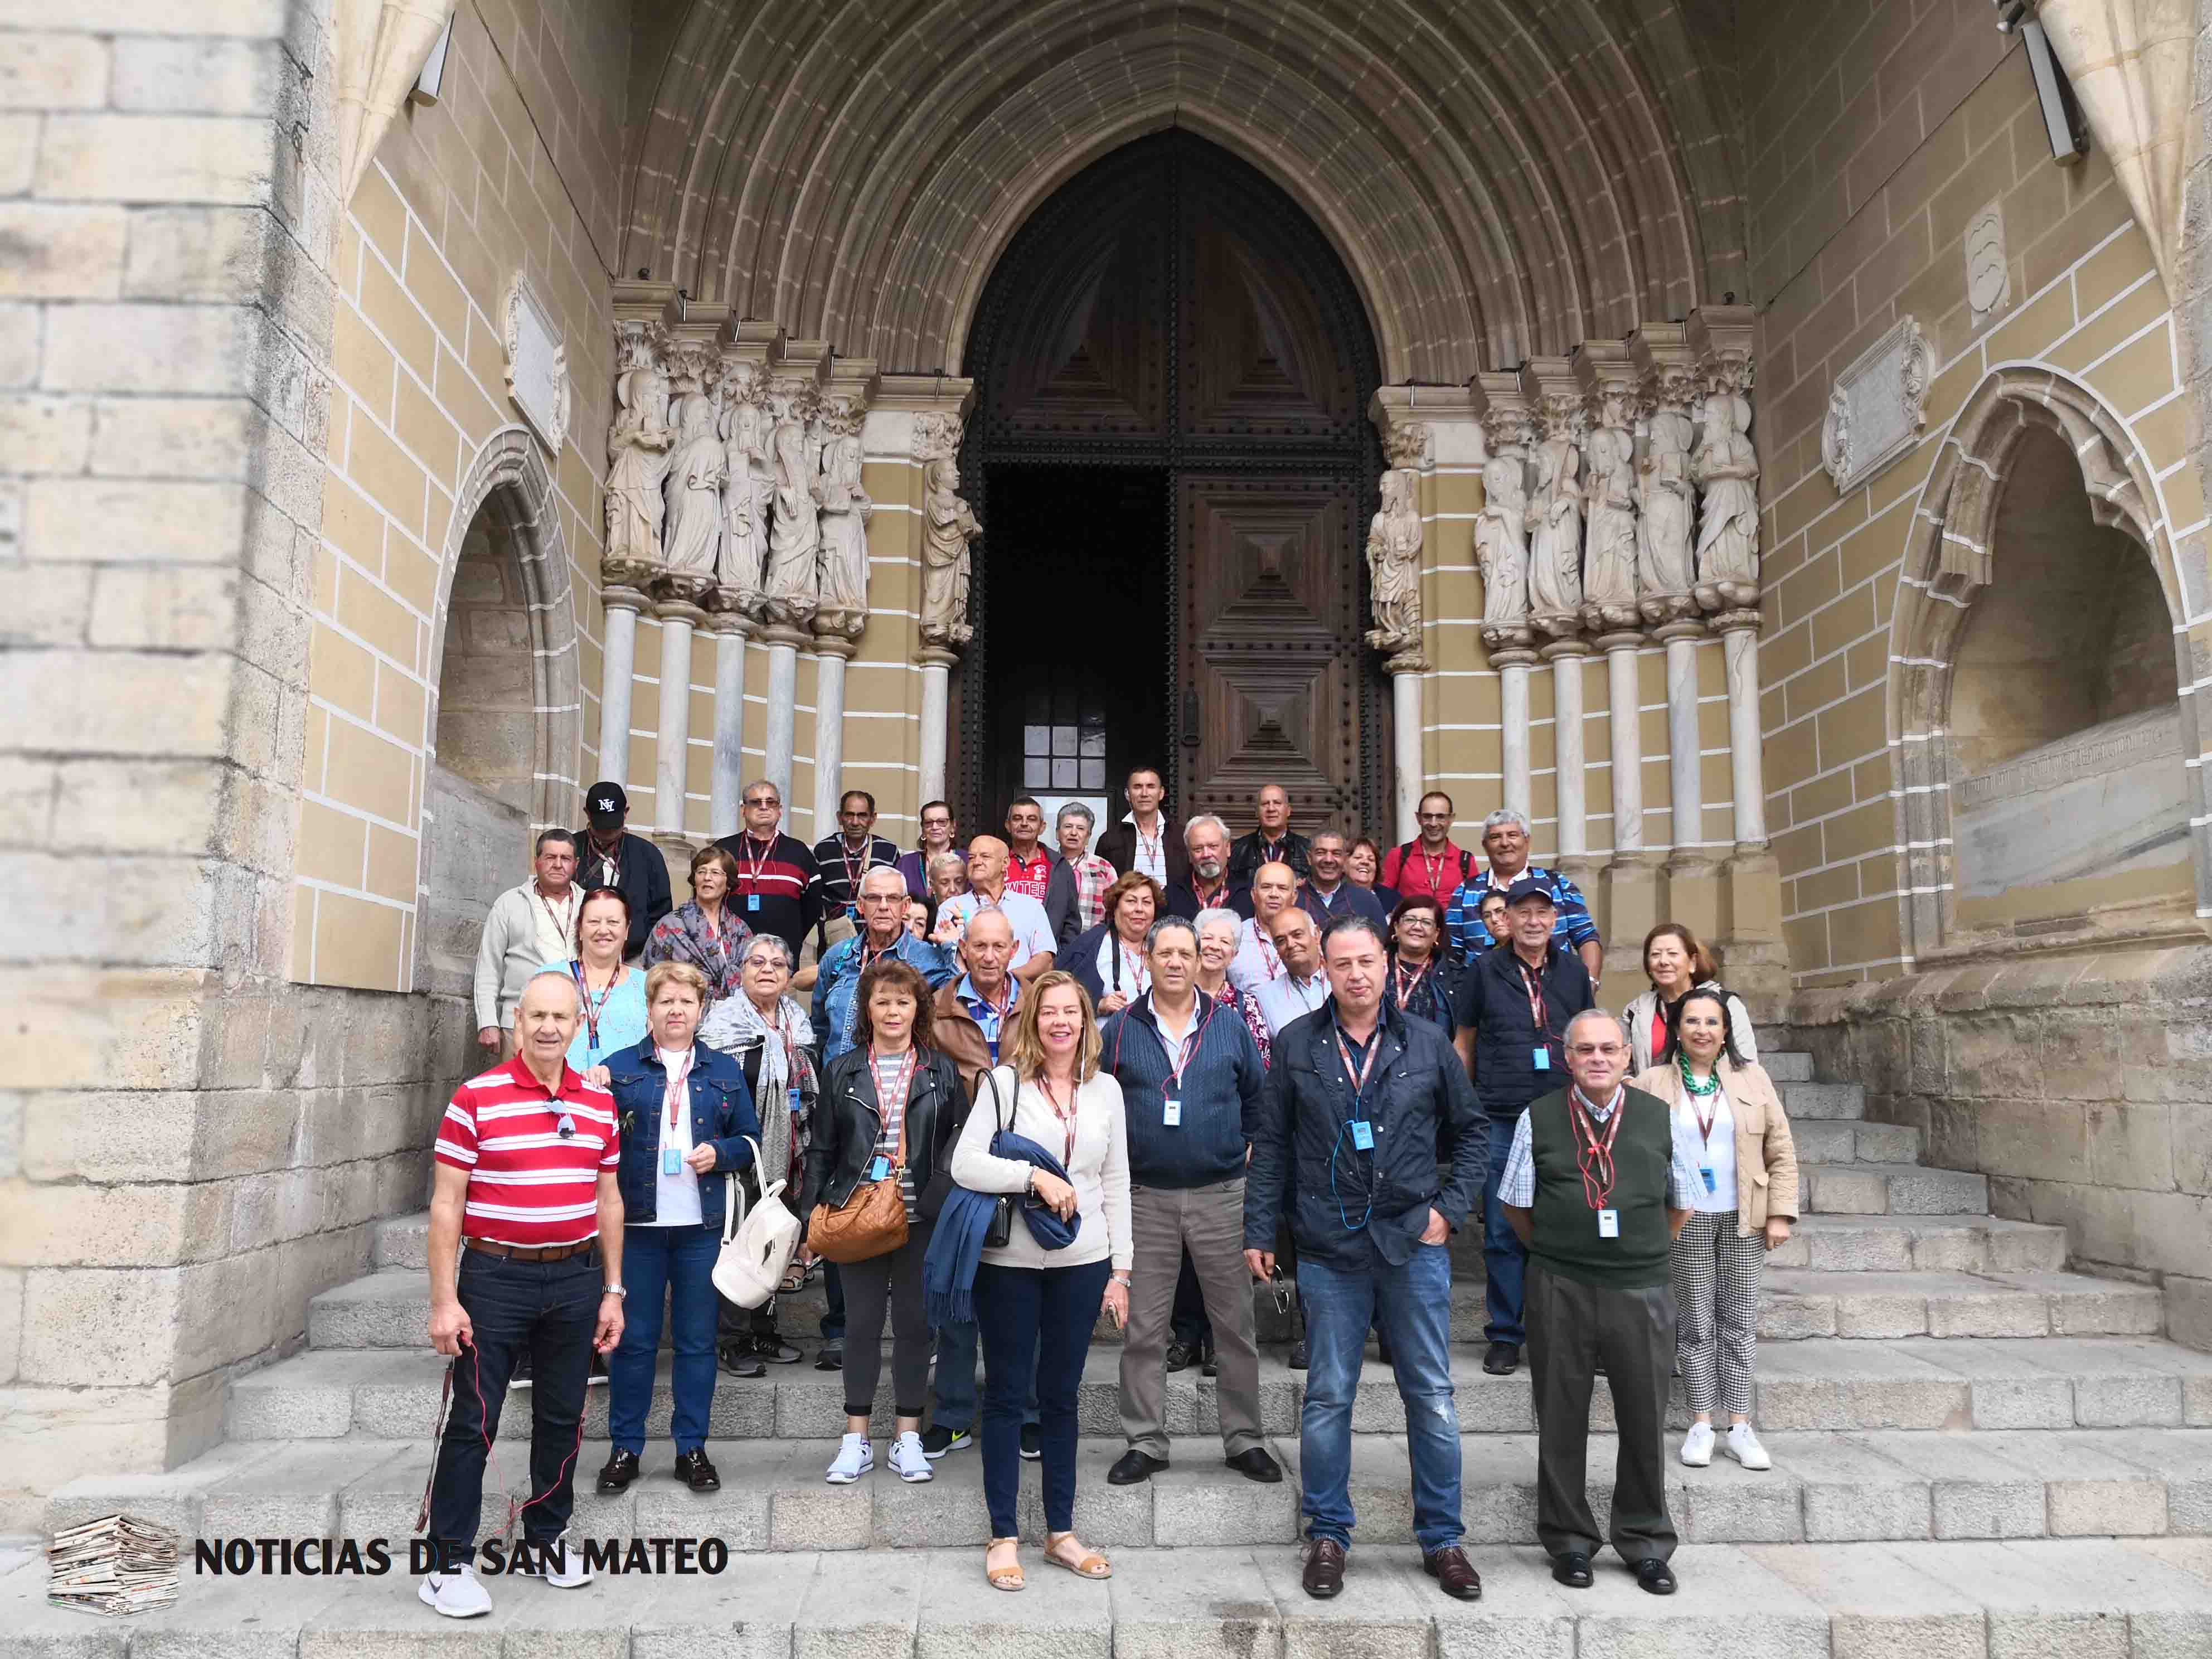 grupo vegueros en evora portugal 26 octubre 2018